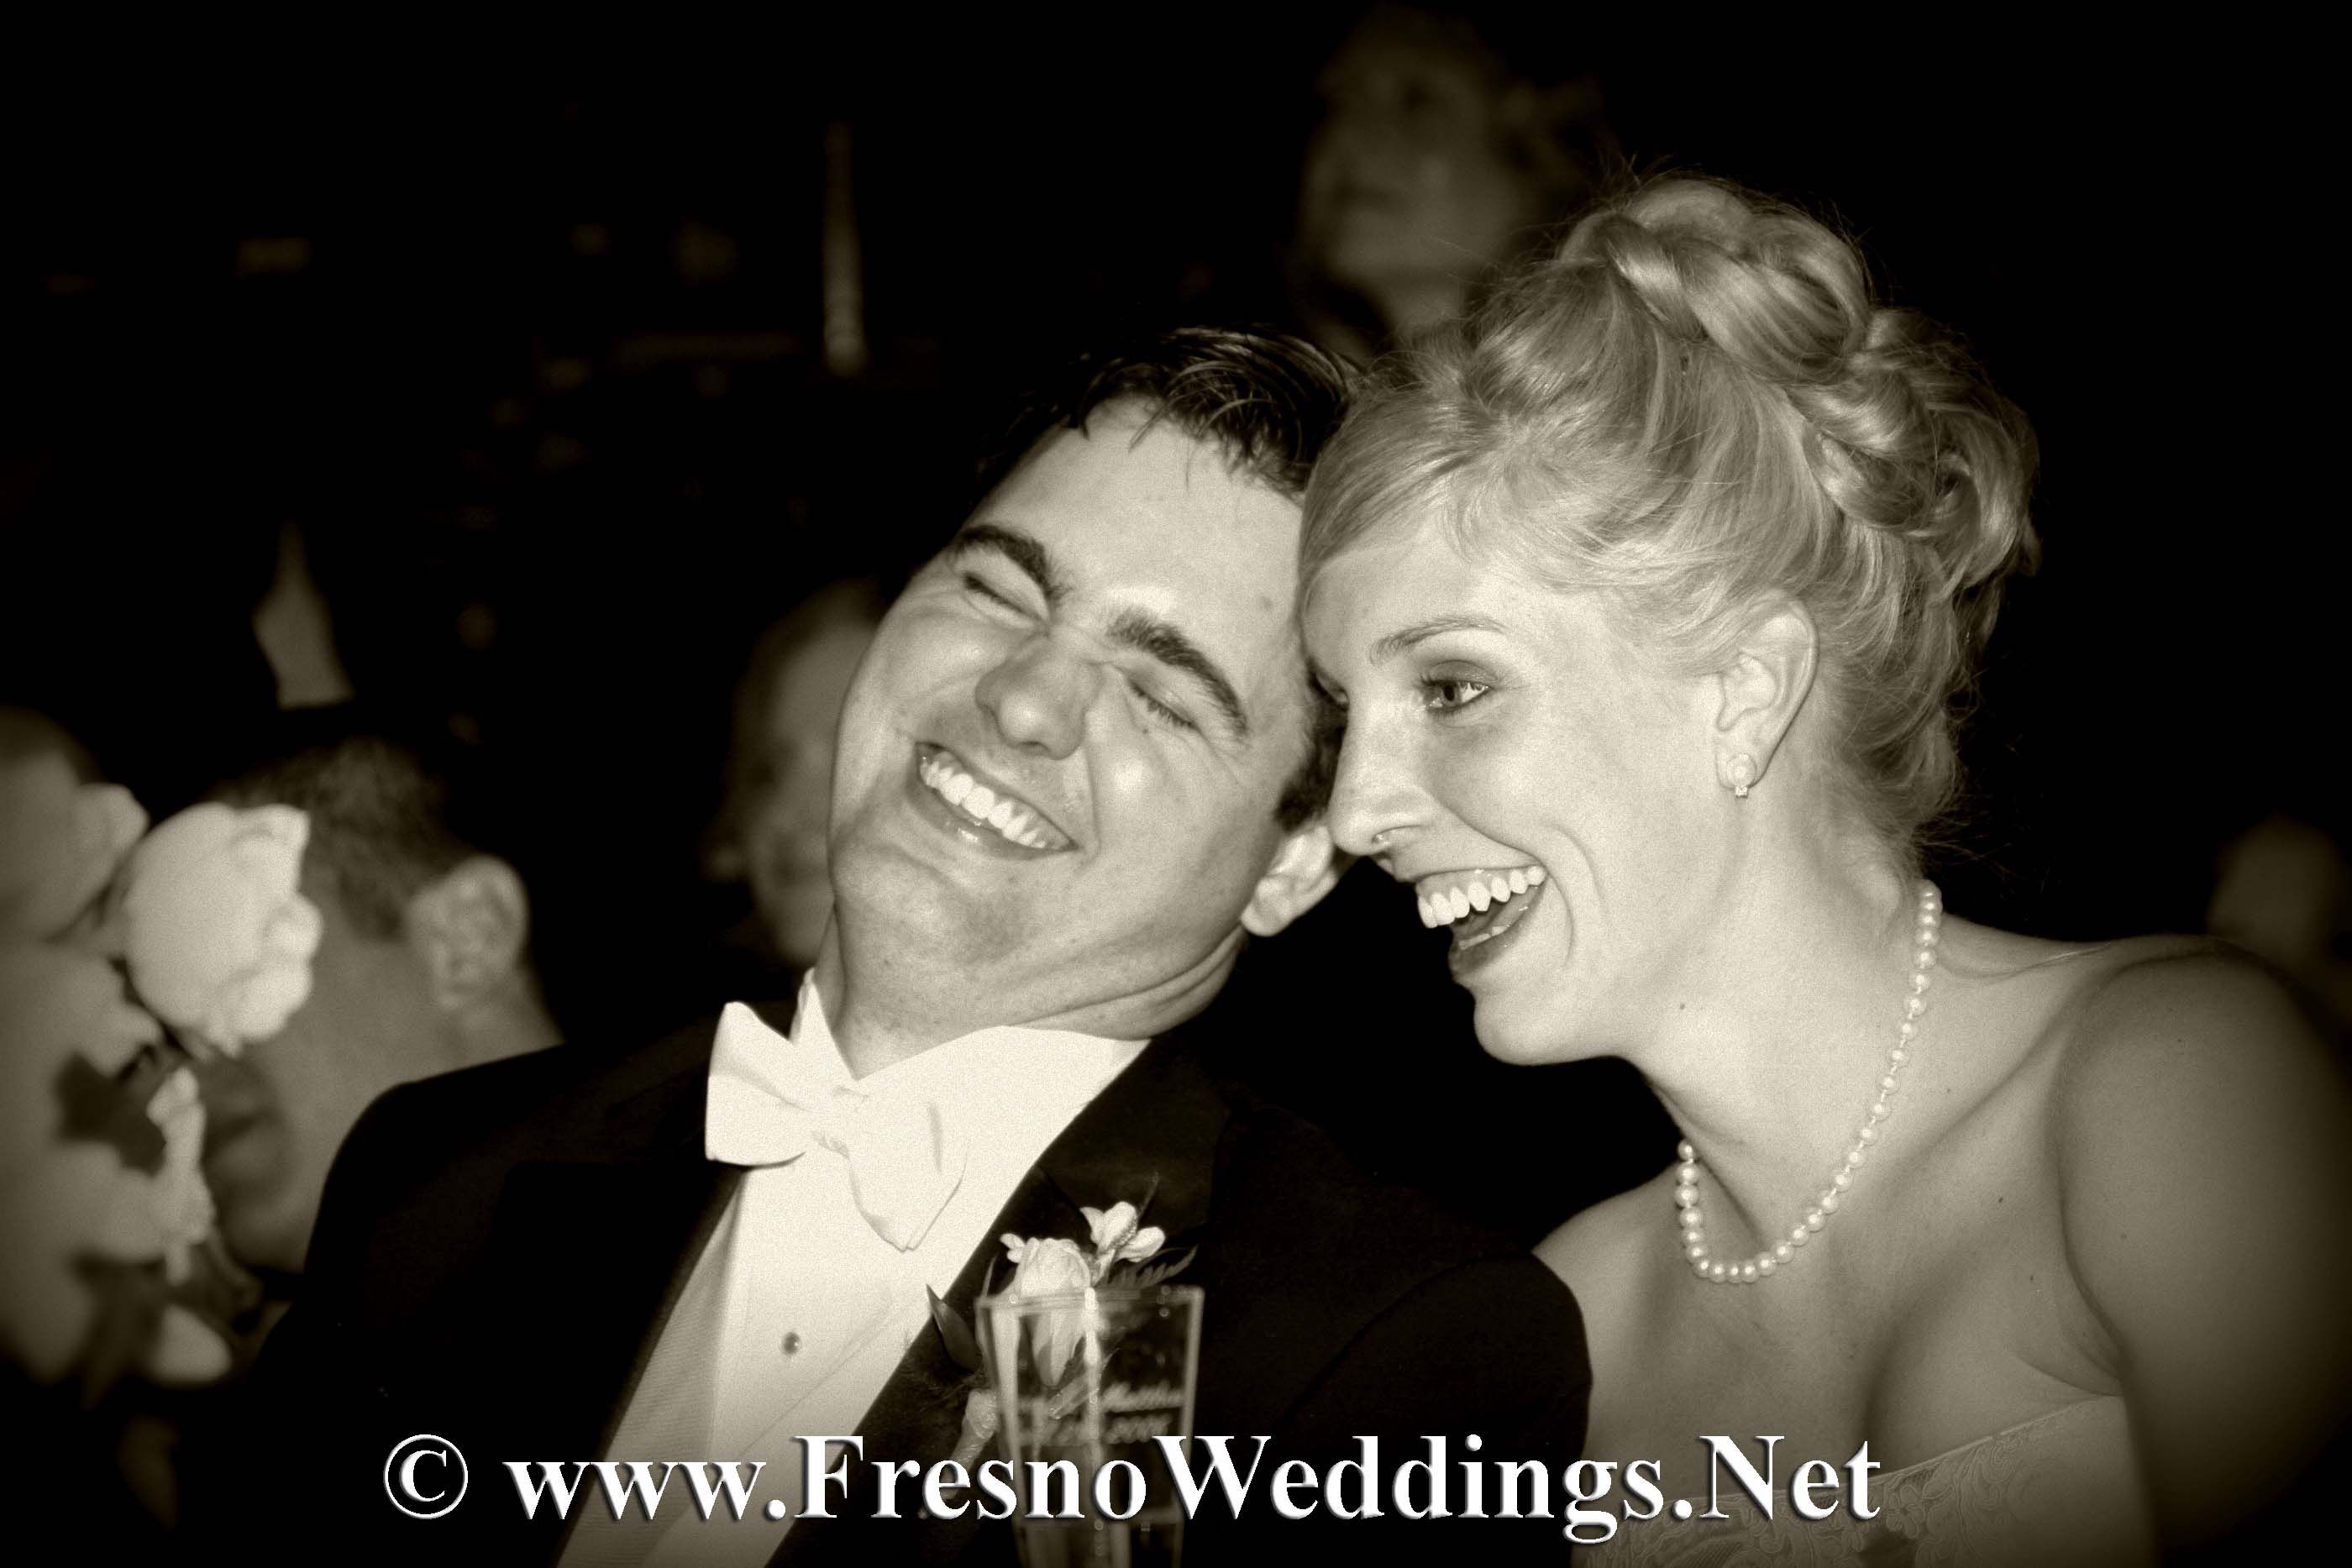 Fresno Wedding Photographers At: www.FresnoWeddingPhotographers.com - #FresnoWeddings #CaliforniaWeddings